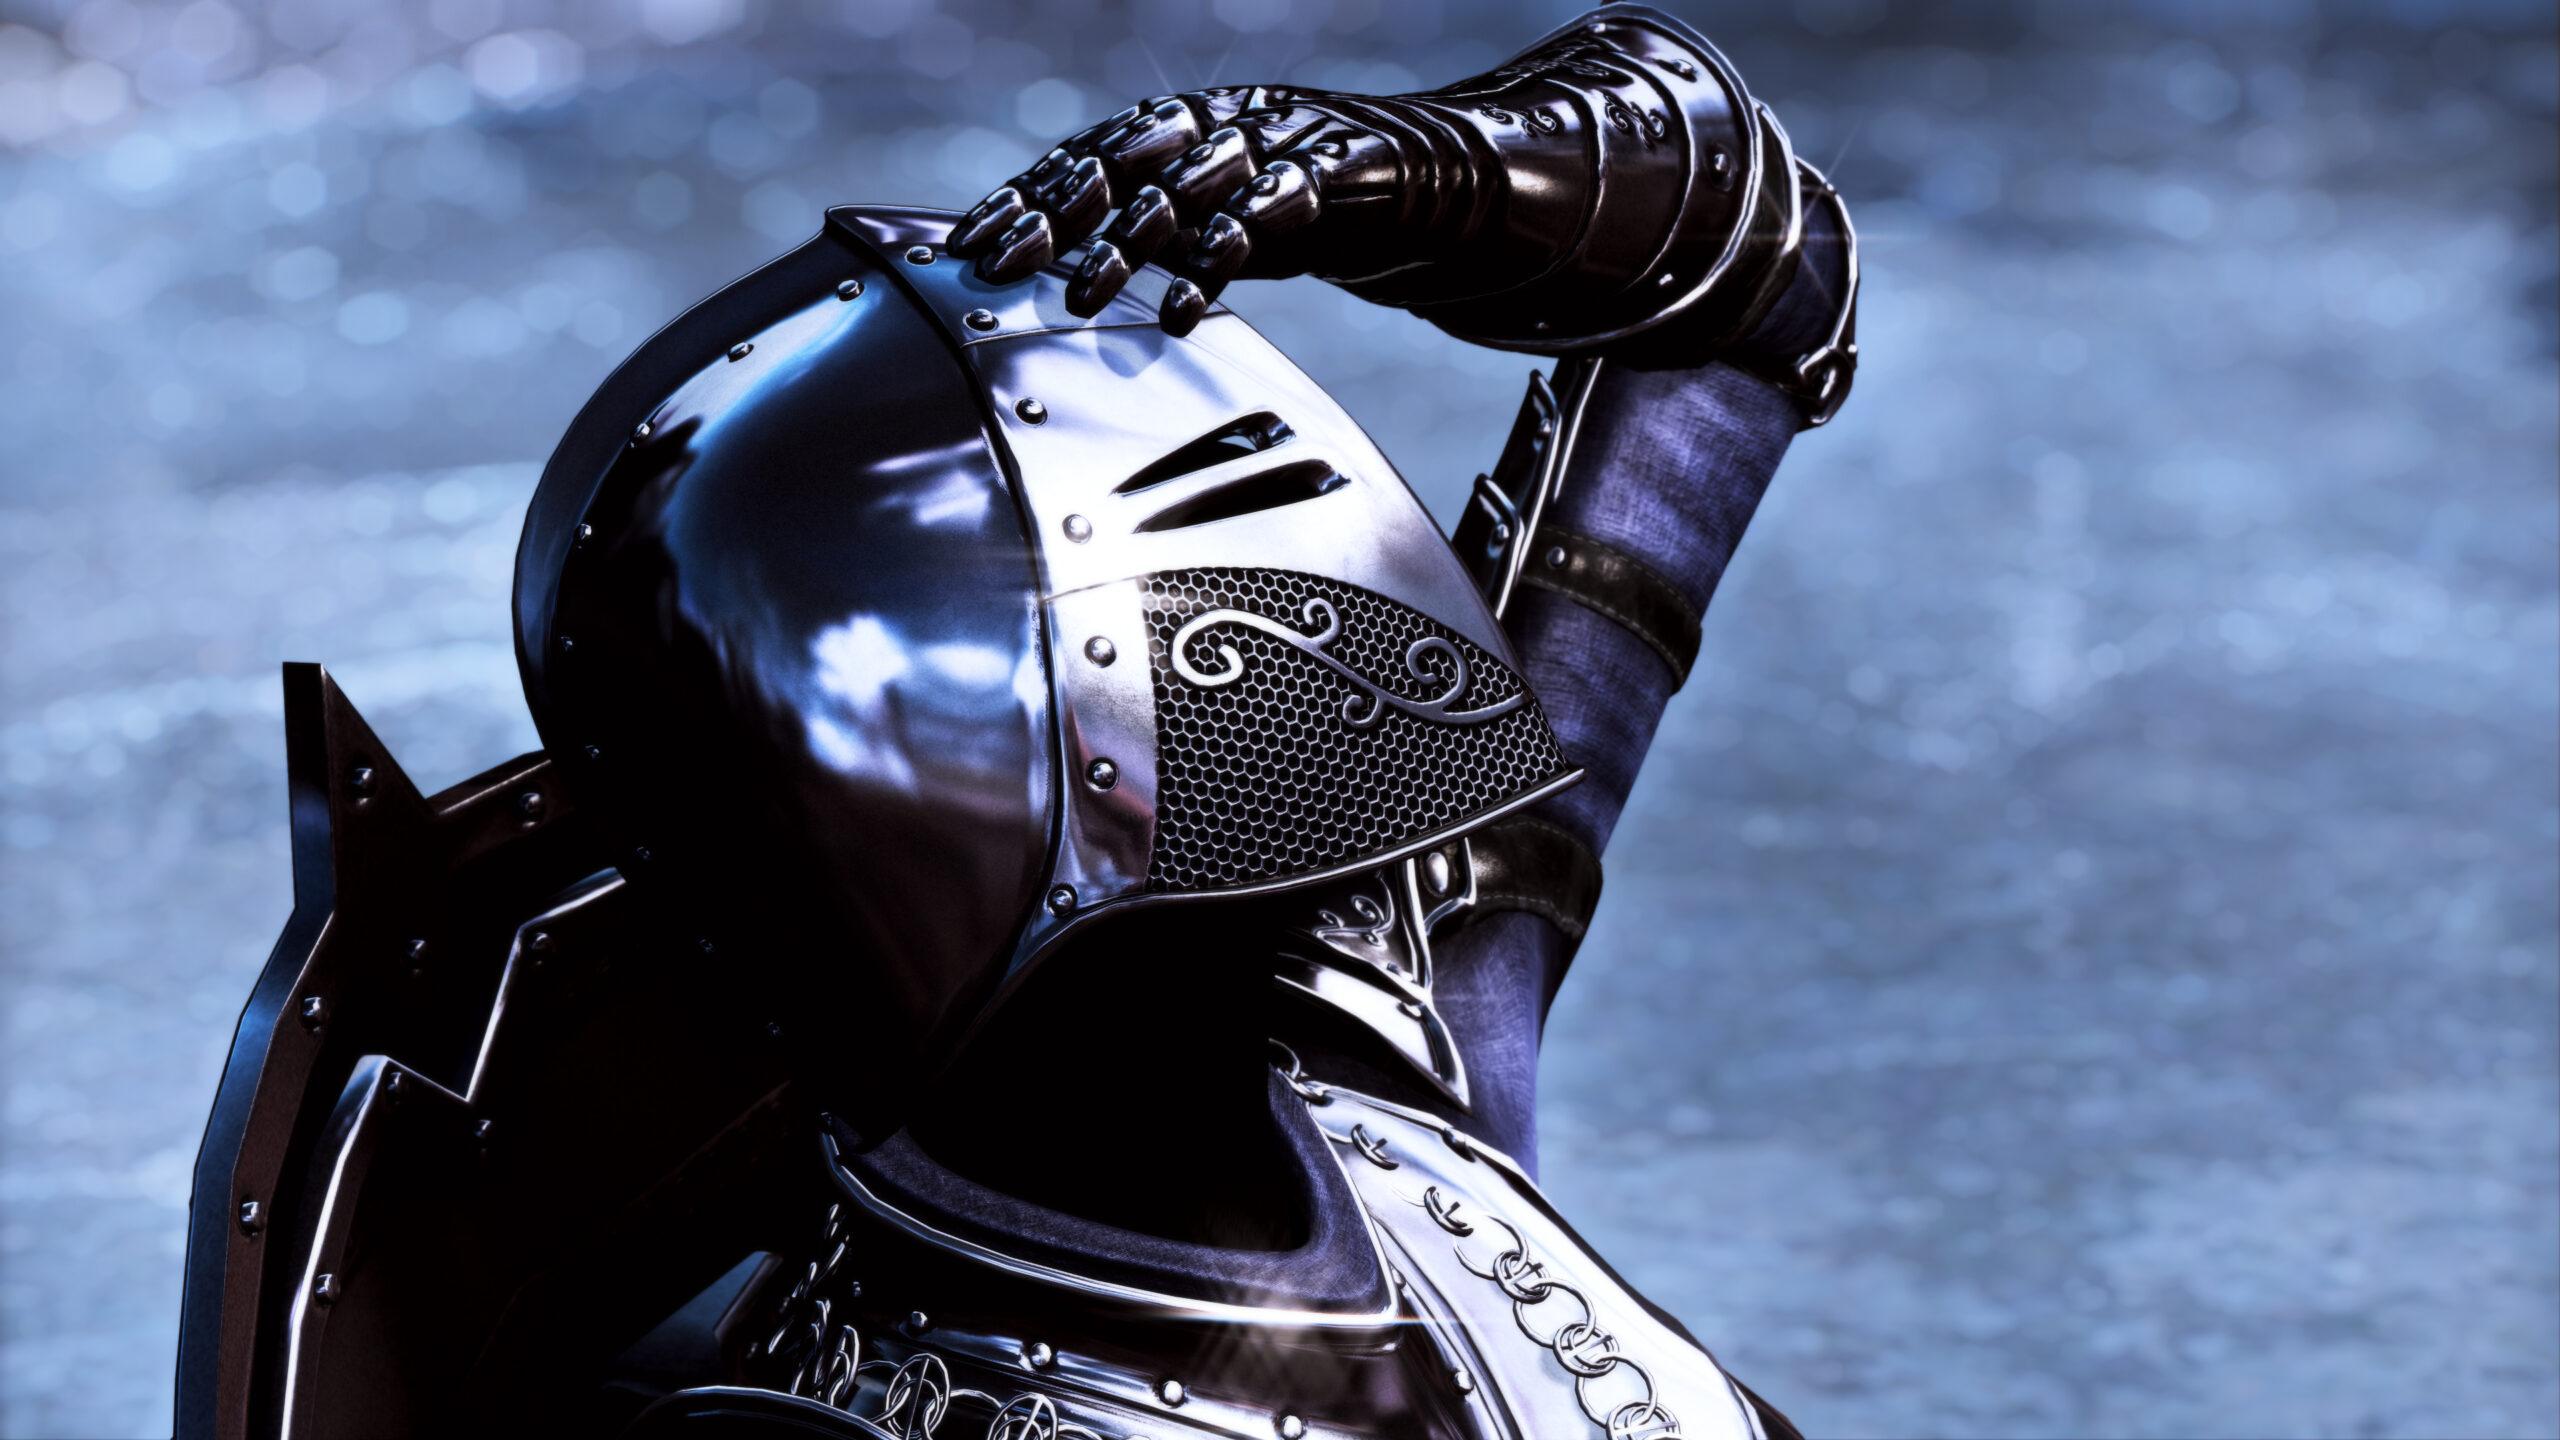 New The Elder Scrolls V Skyrim Dark Knight Mod Introduces Impressive Looking Ebony Armor And Shield Dragon knight armor by hothtrooper44 thanks for watching! new the elder scrolls v skyrim dark